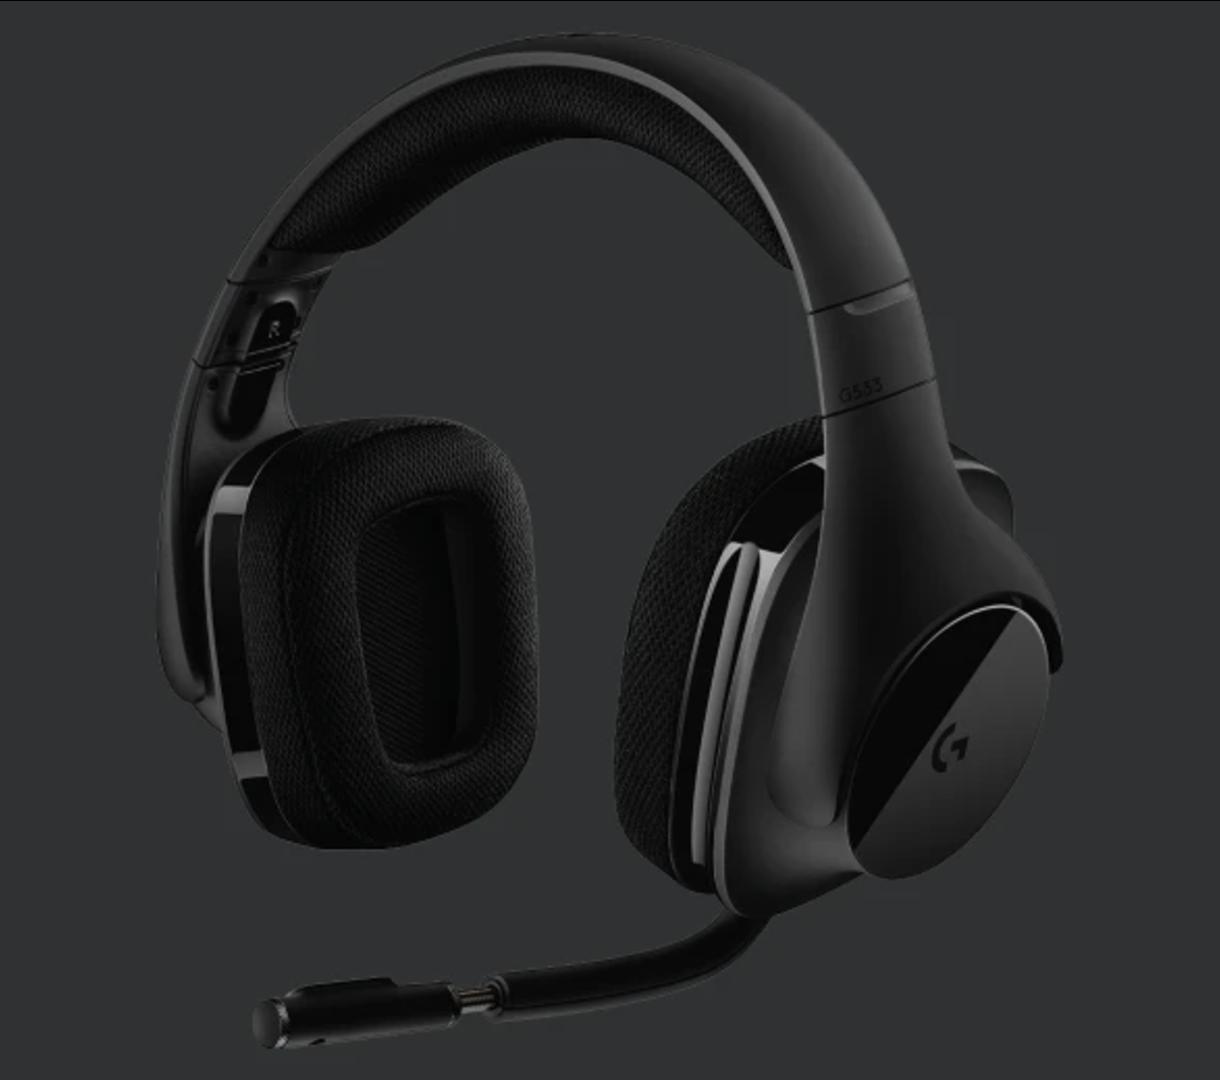 Logitech Wireless Headphones